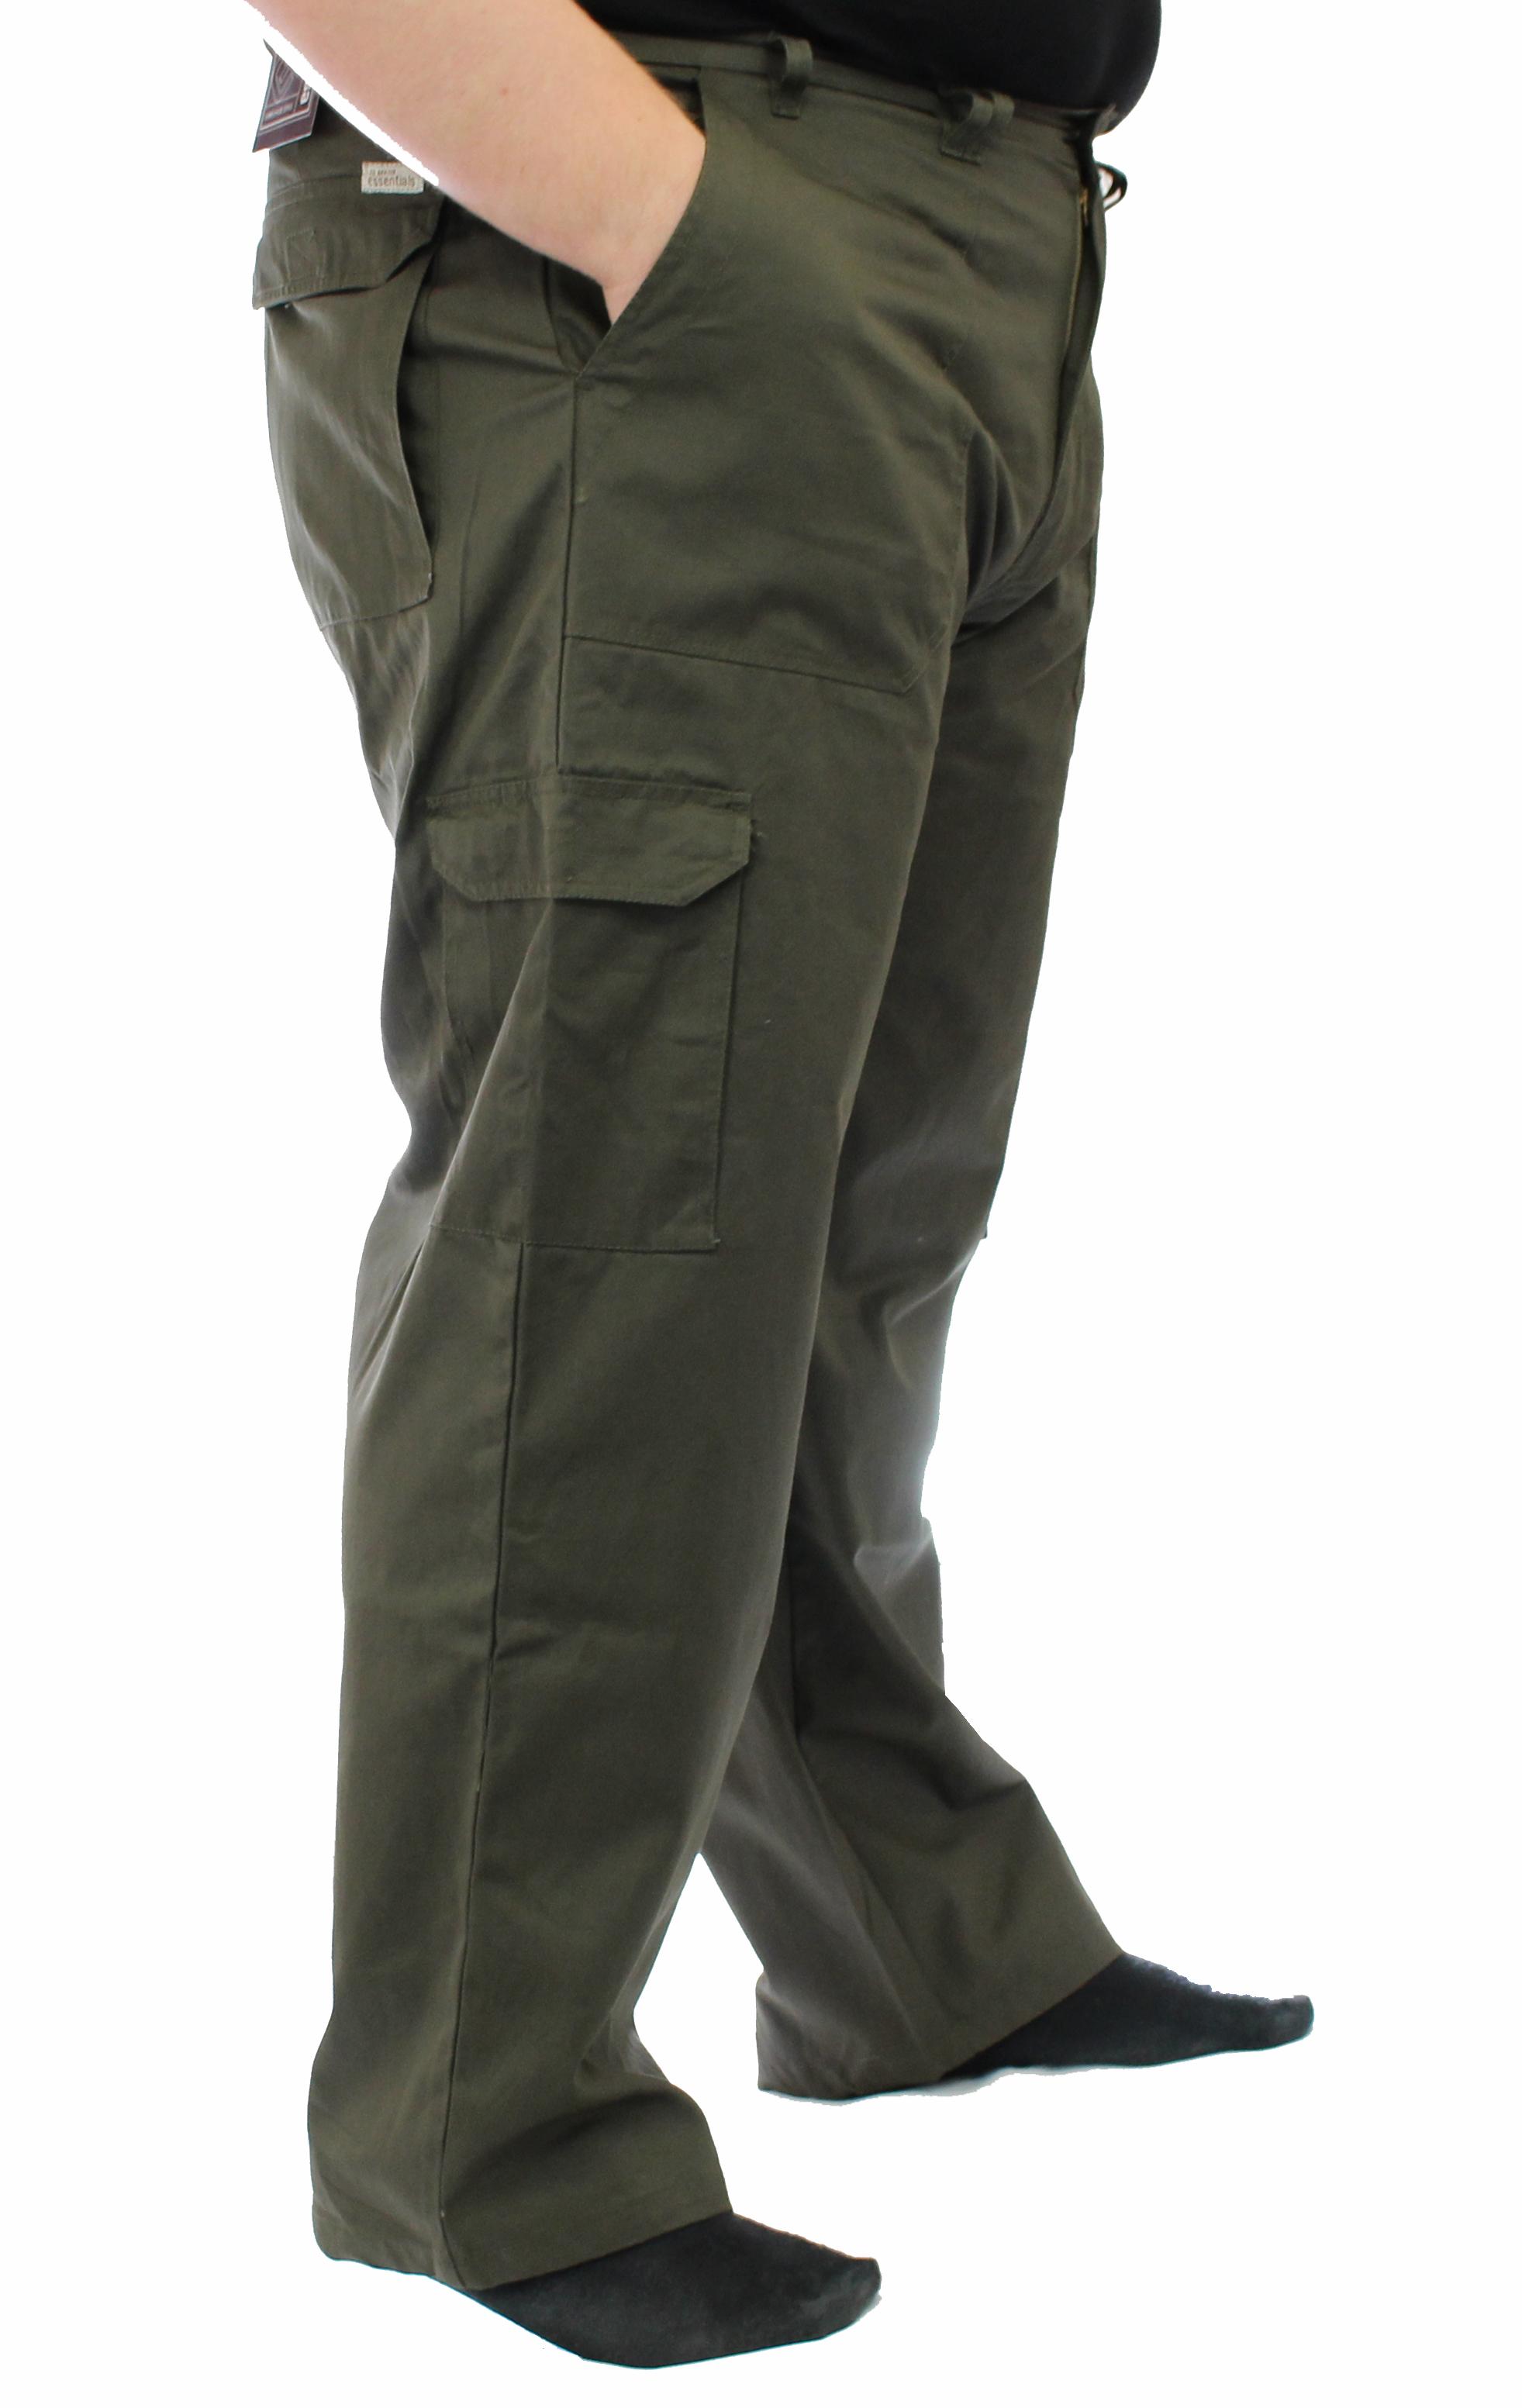 "Ed Baxter Victory - Heavy Duty Cargo Combat Trousers - Khaki - 60"" Waist, 32"" Leg"